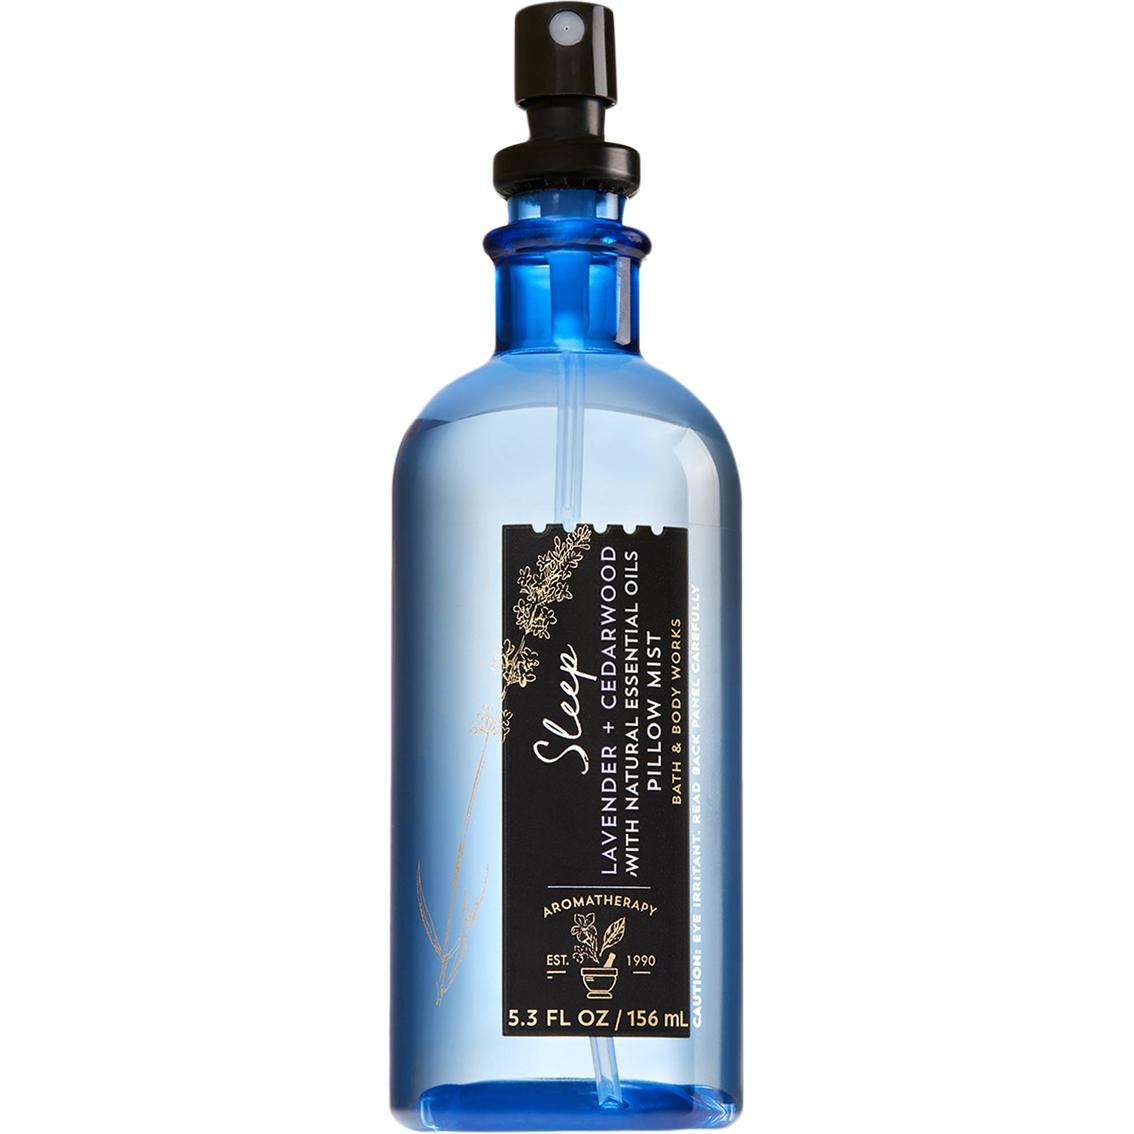 Bath Body Works Aromatherapy Sleep Lavender Cedarwood